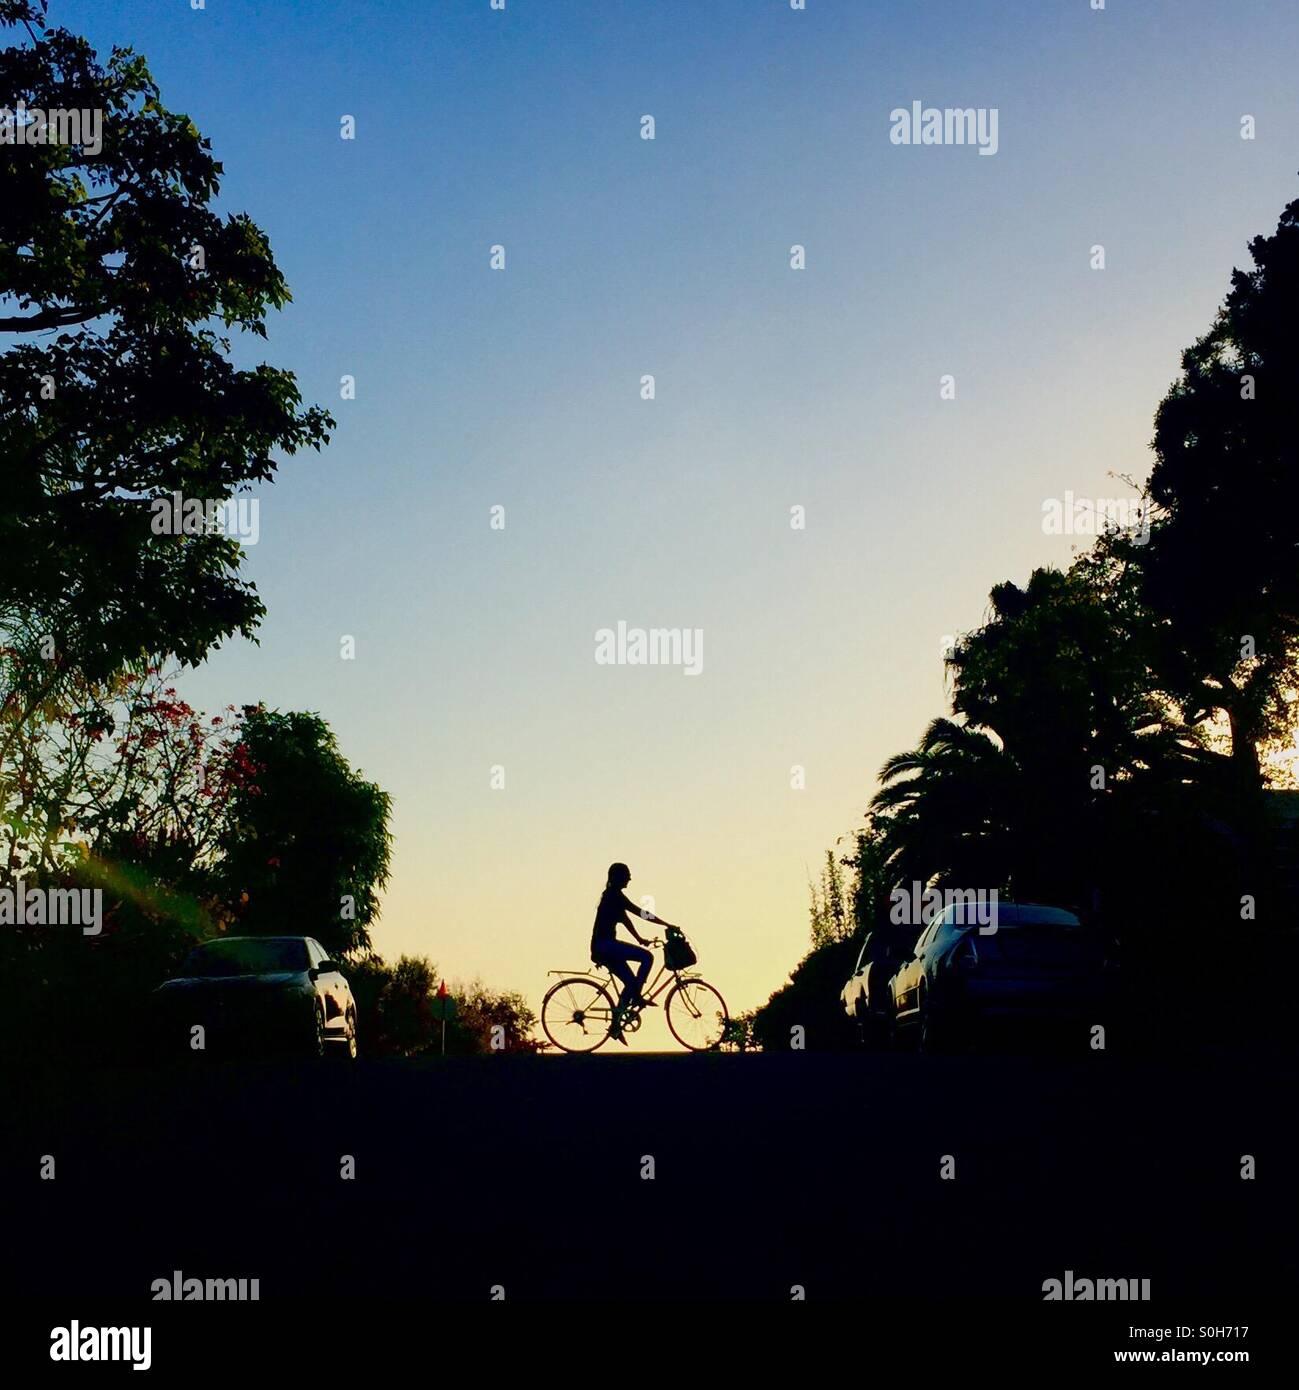 Silueta de una niña de montar bicicleta Foto de stock